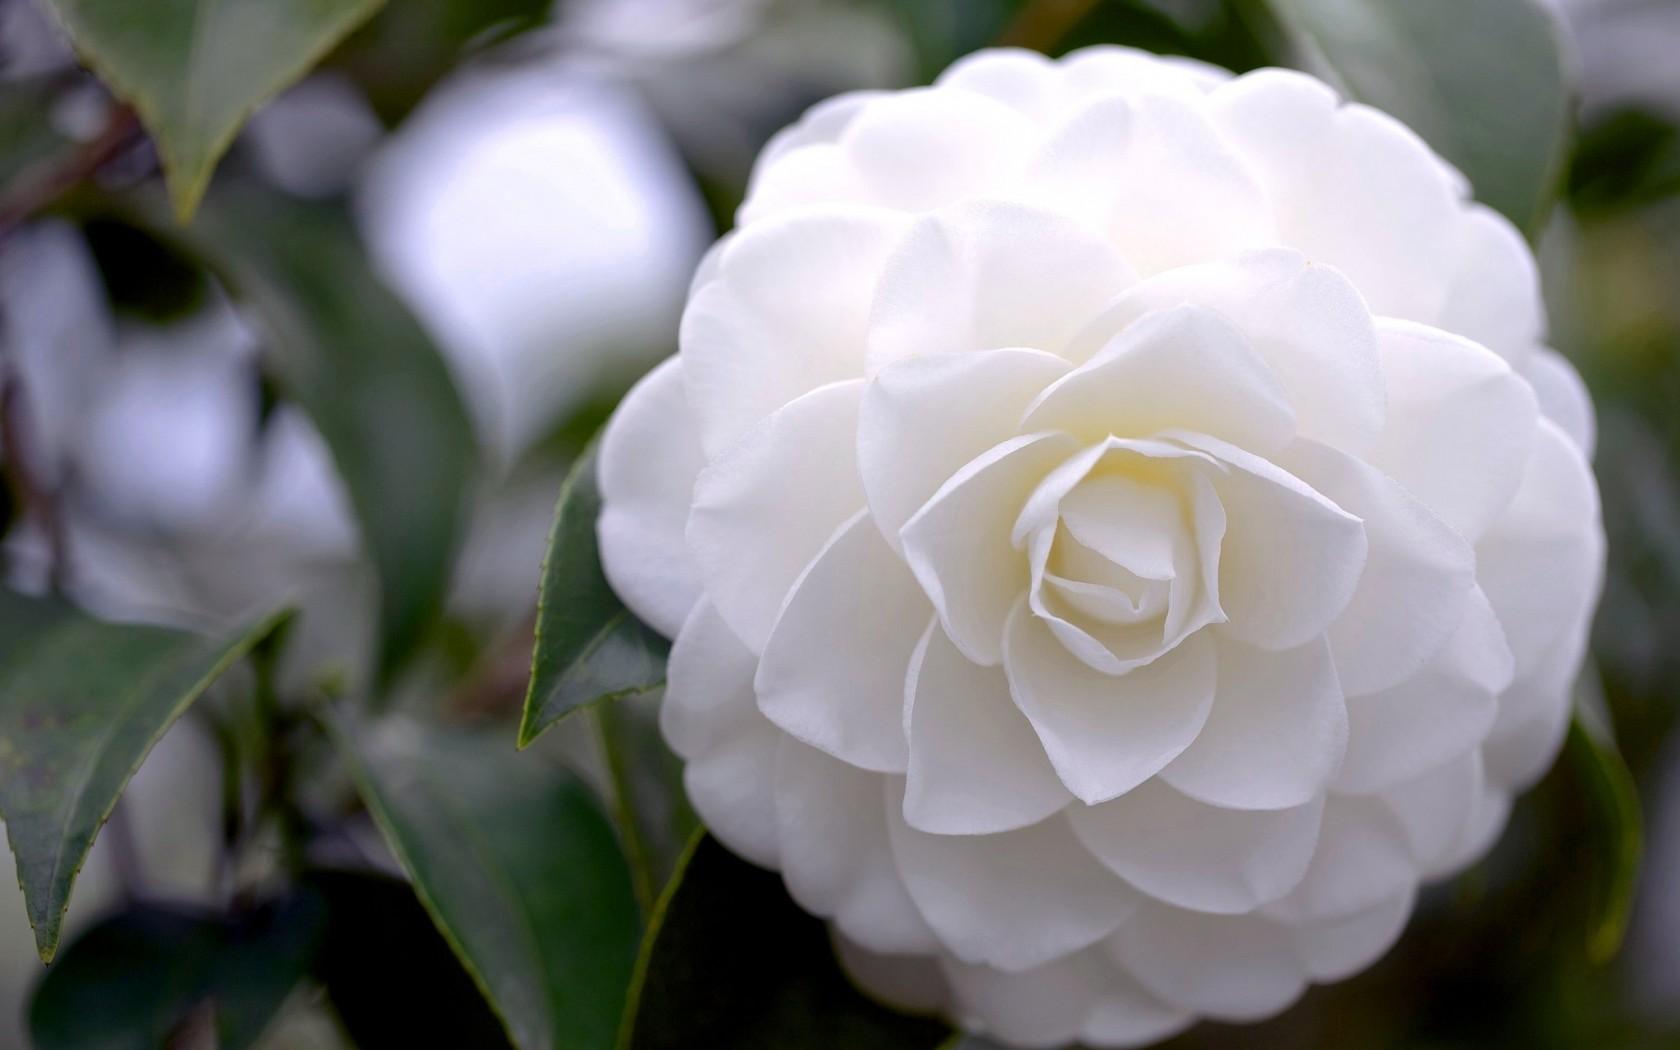 Camellia white flower 10 high resolution wallpaper camellia white flower 10 high resolution wallpaper mightylinksfo